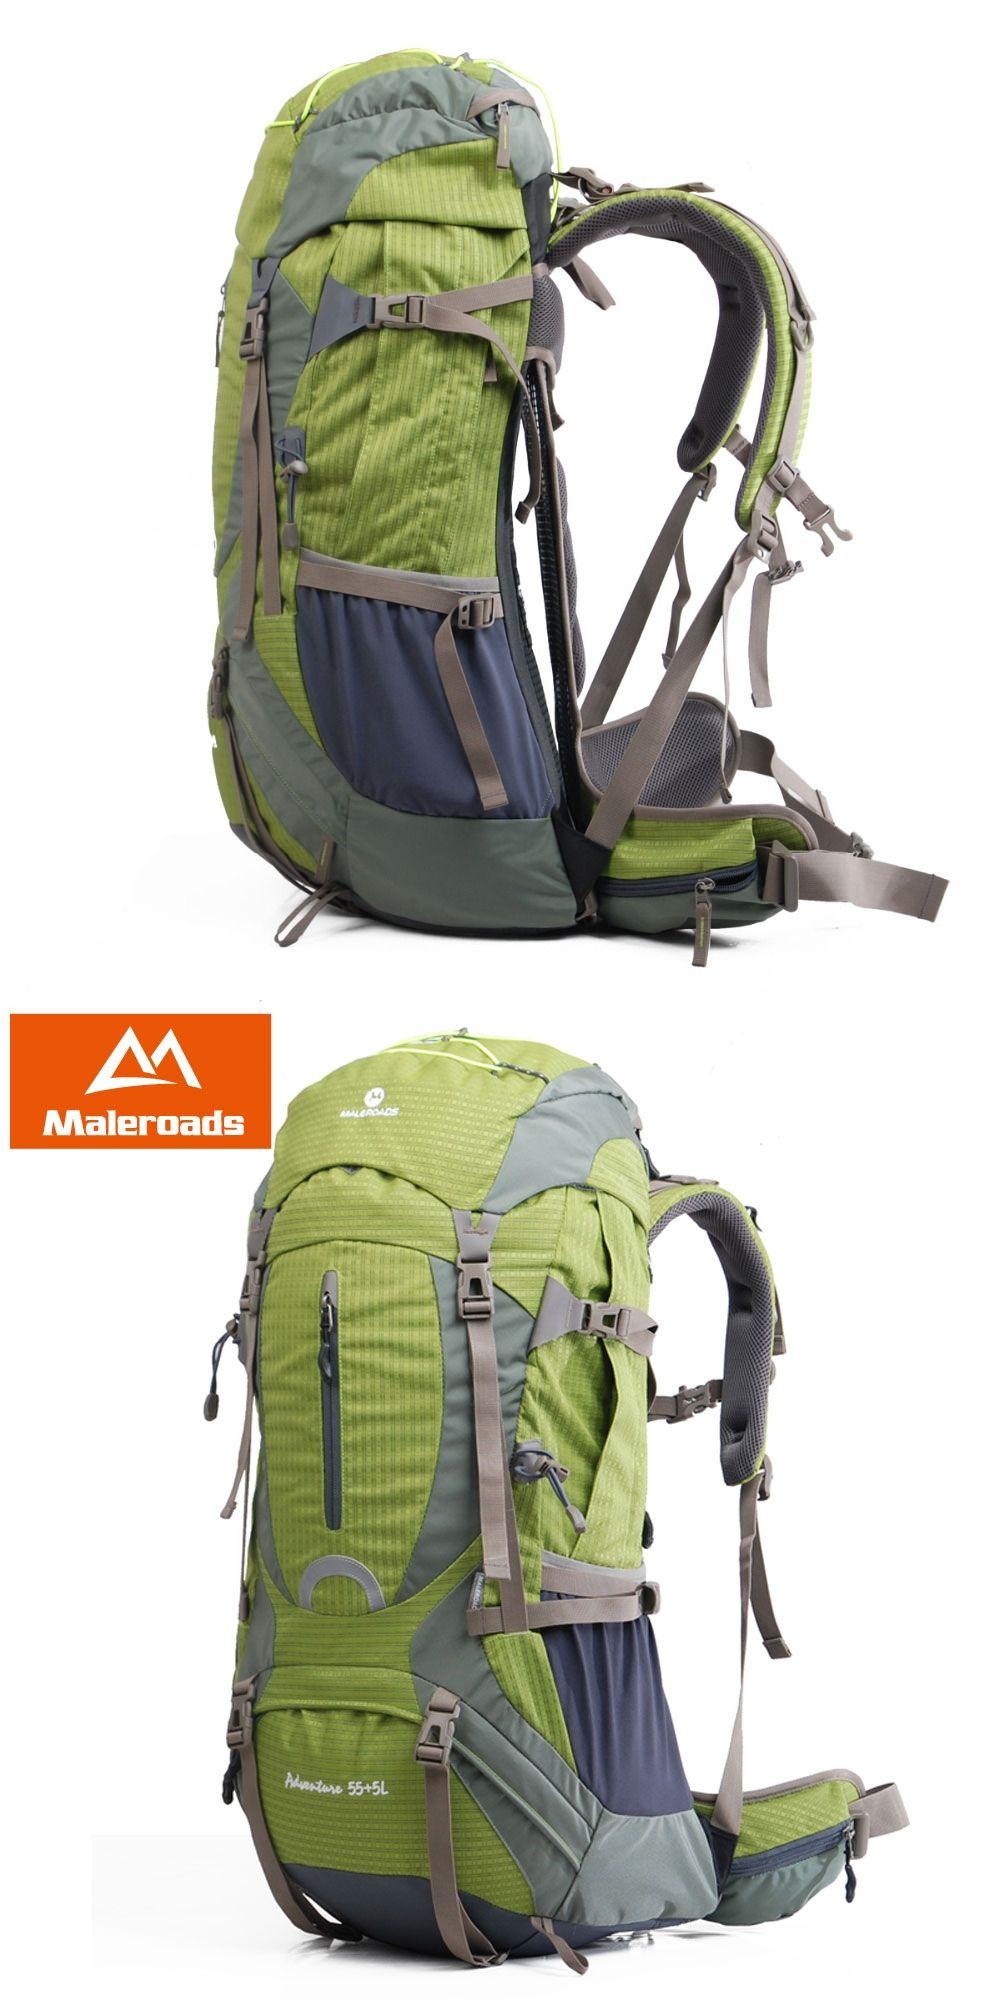 6cc49a3e6696 Maleroads High quality Professional Mountaineering climb backpack Trekking  pack camp equipment hike gear 50L 60L for men women